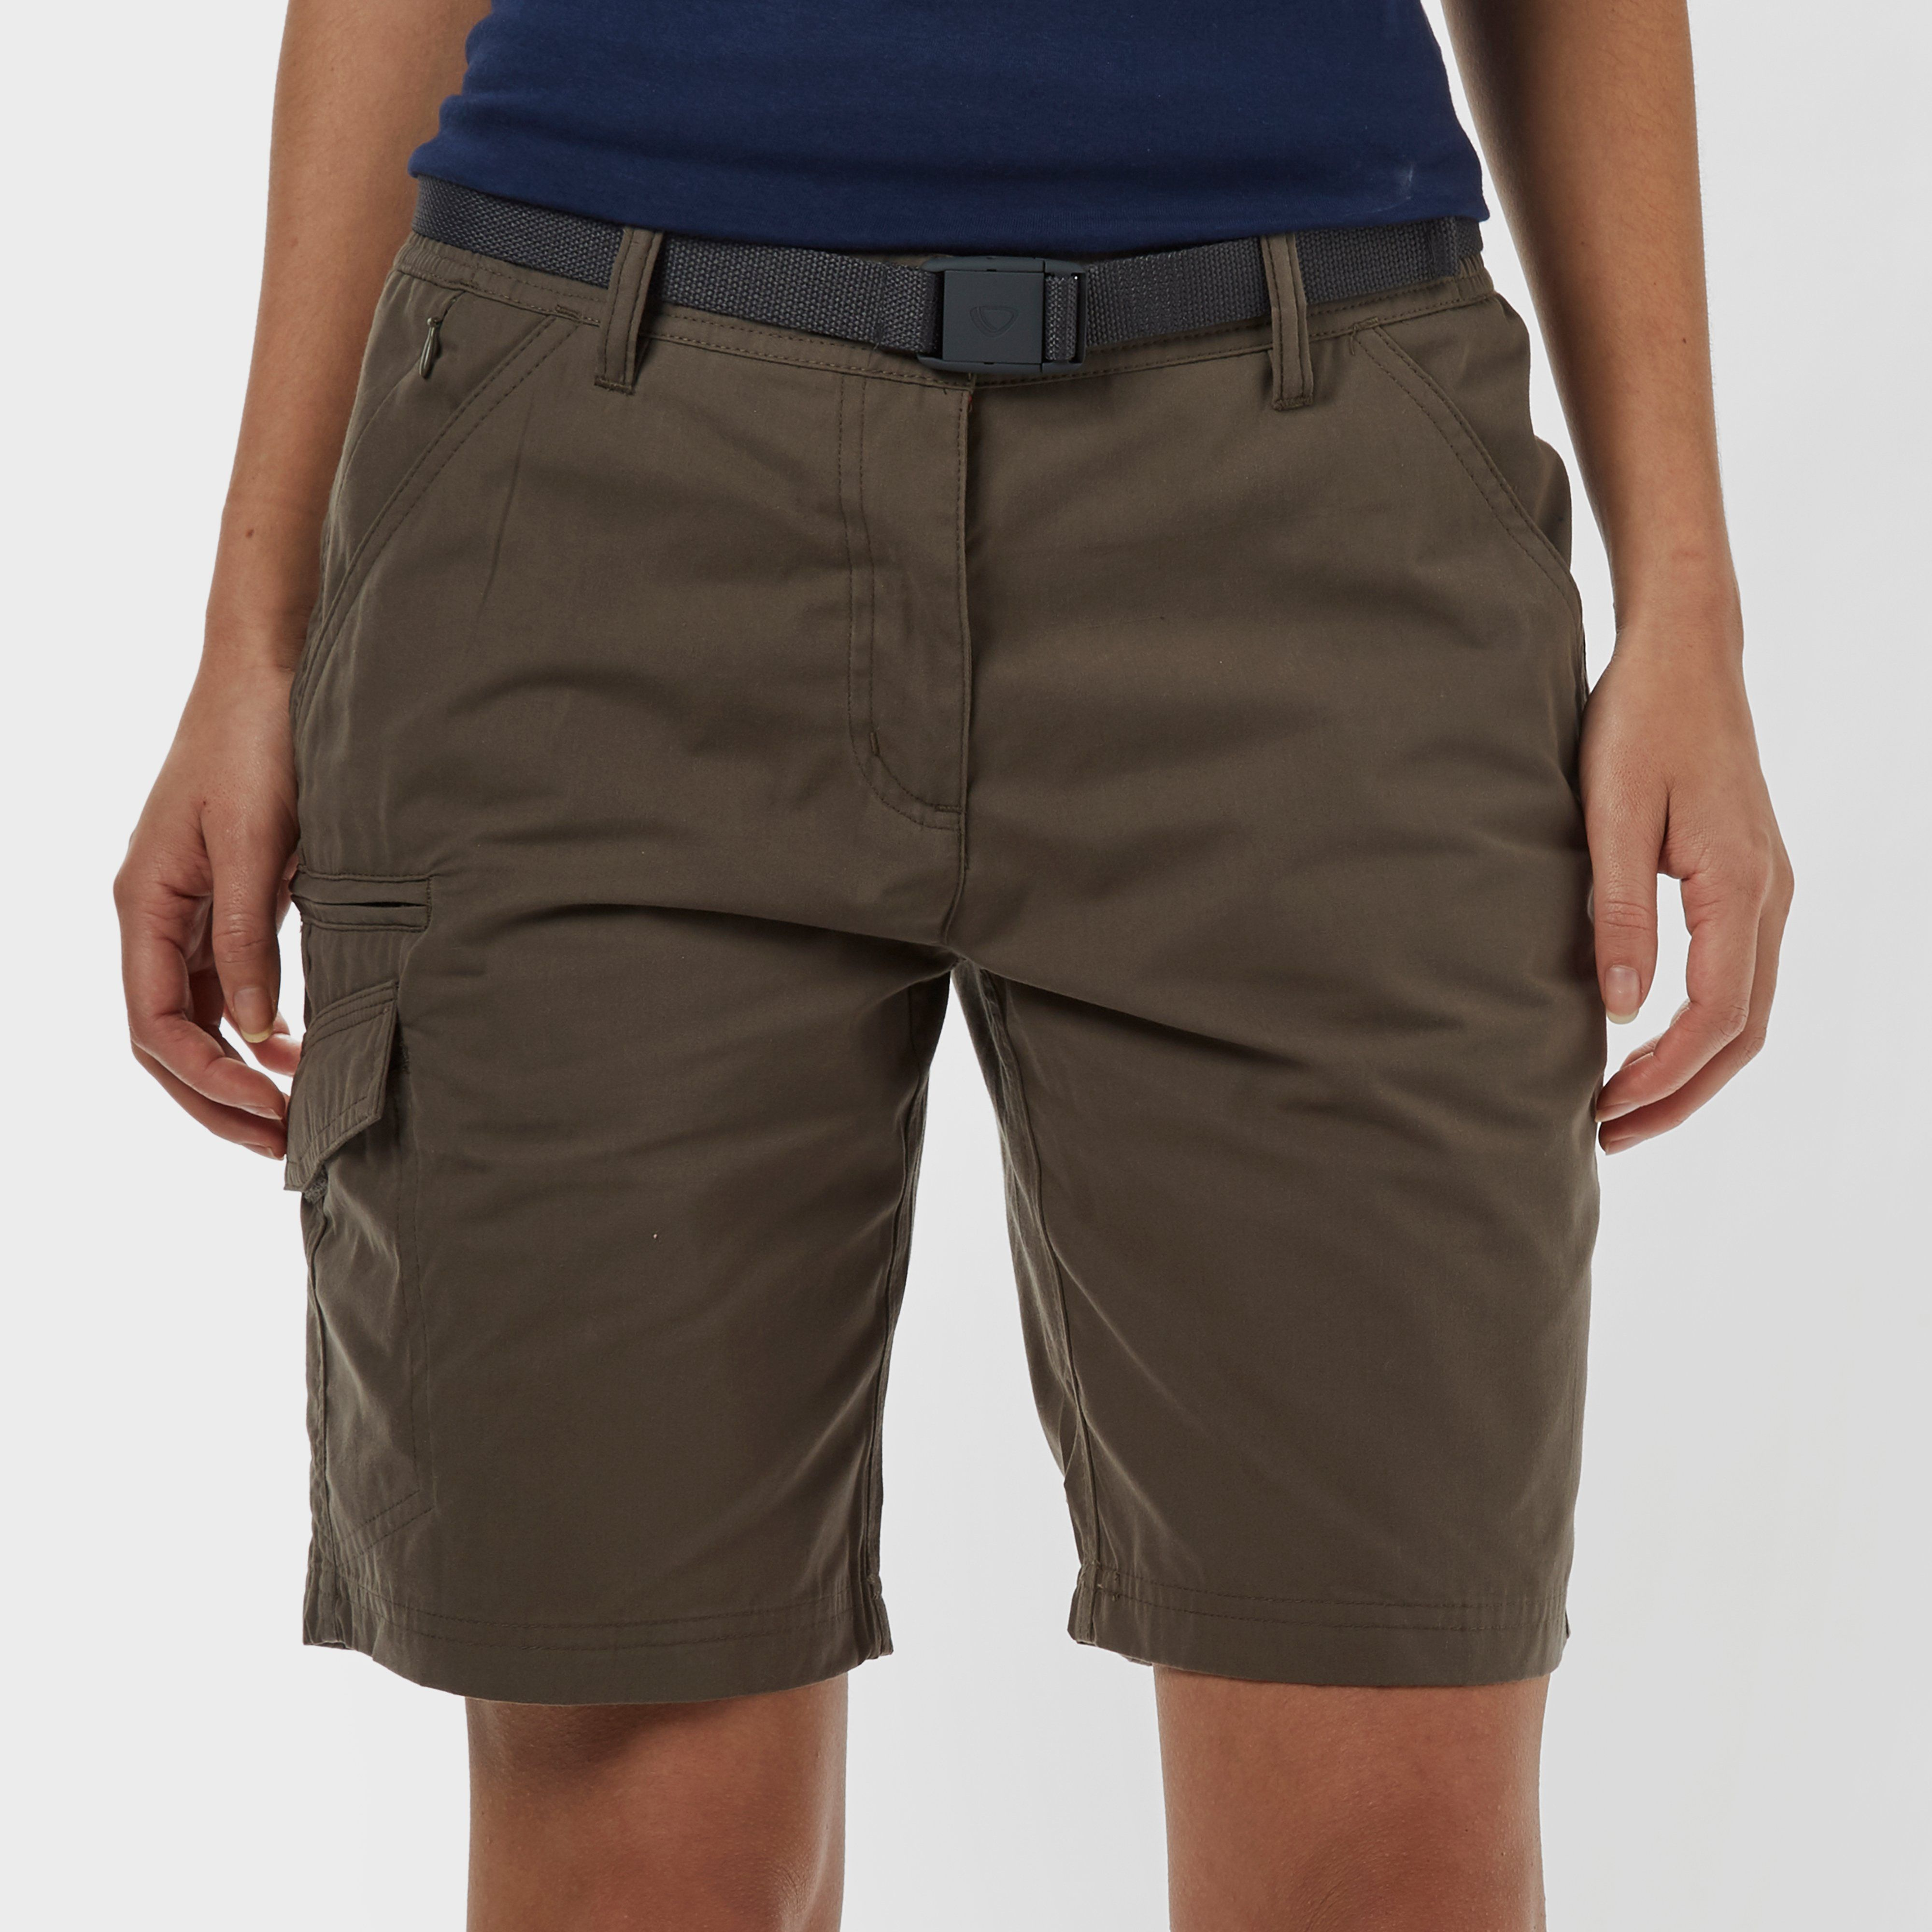 BRASHER Women's Walking Shorts